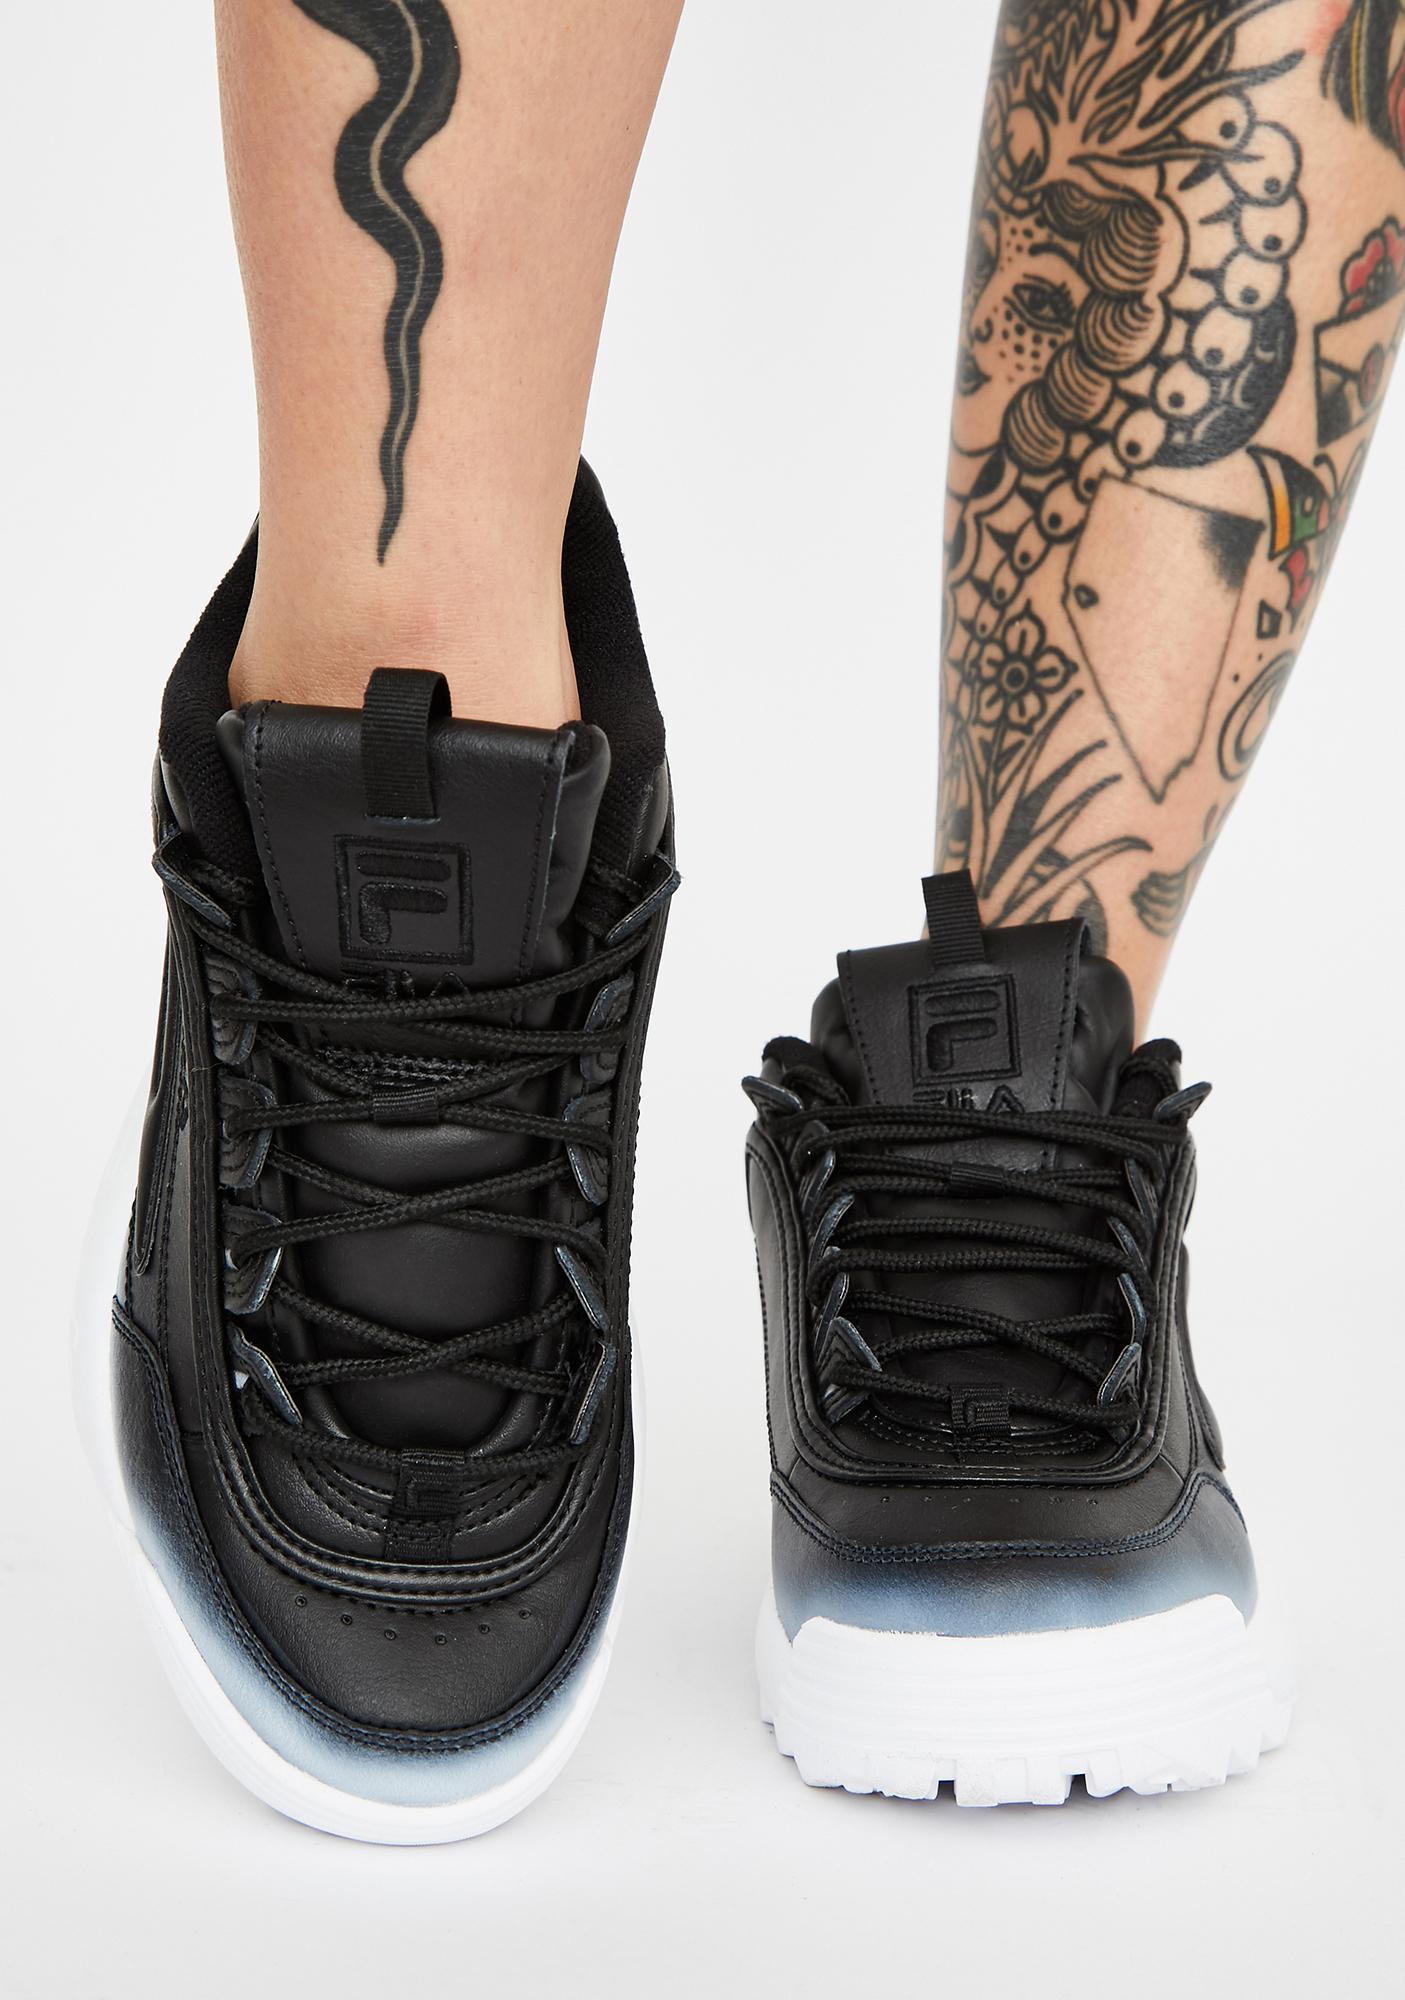 Fila Disruptor 2 Fade Sneakers